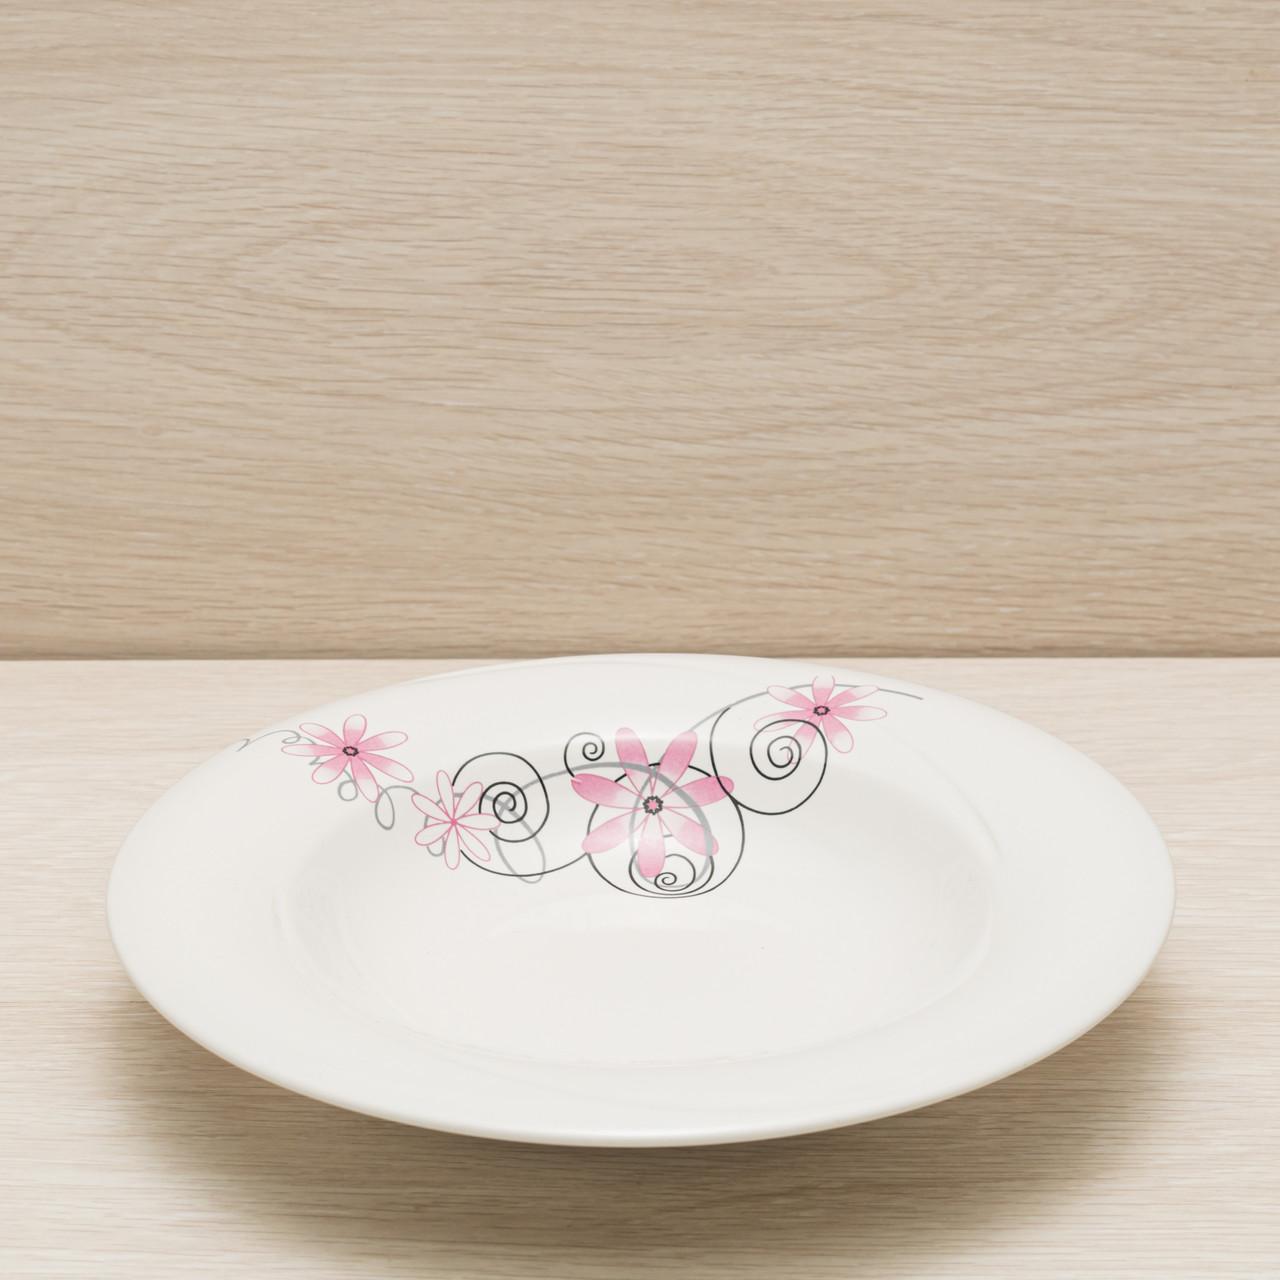 Тарелка для пасты диаметр 24 см деколь, глянцевый